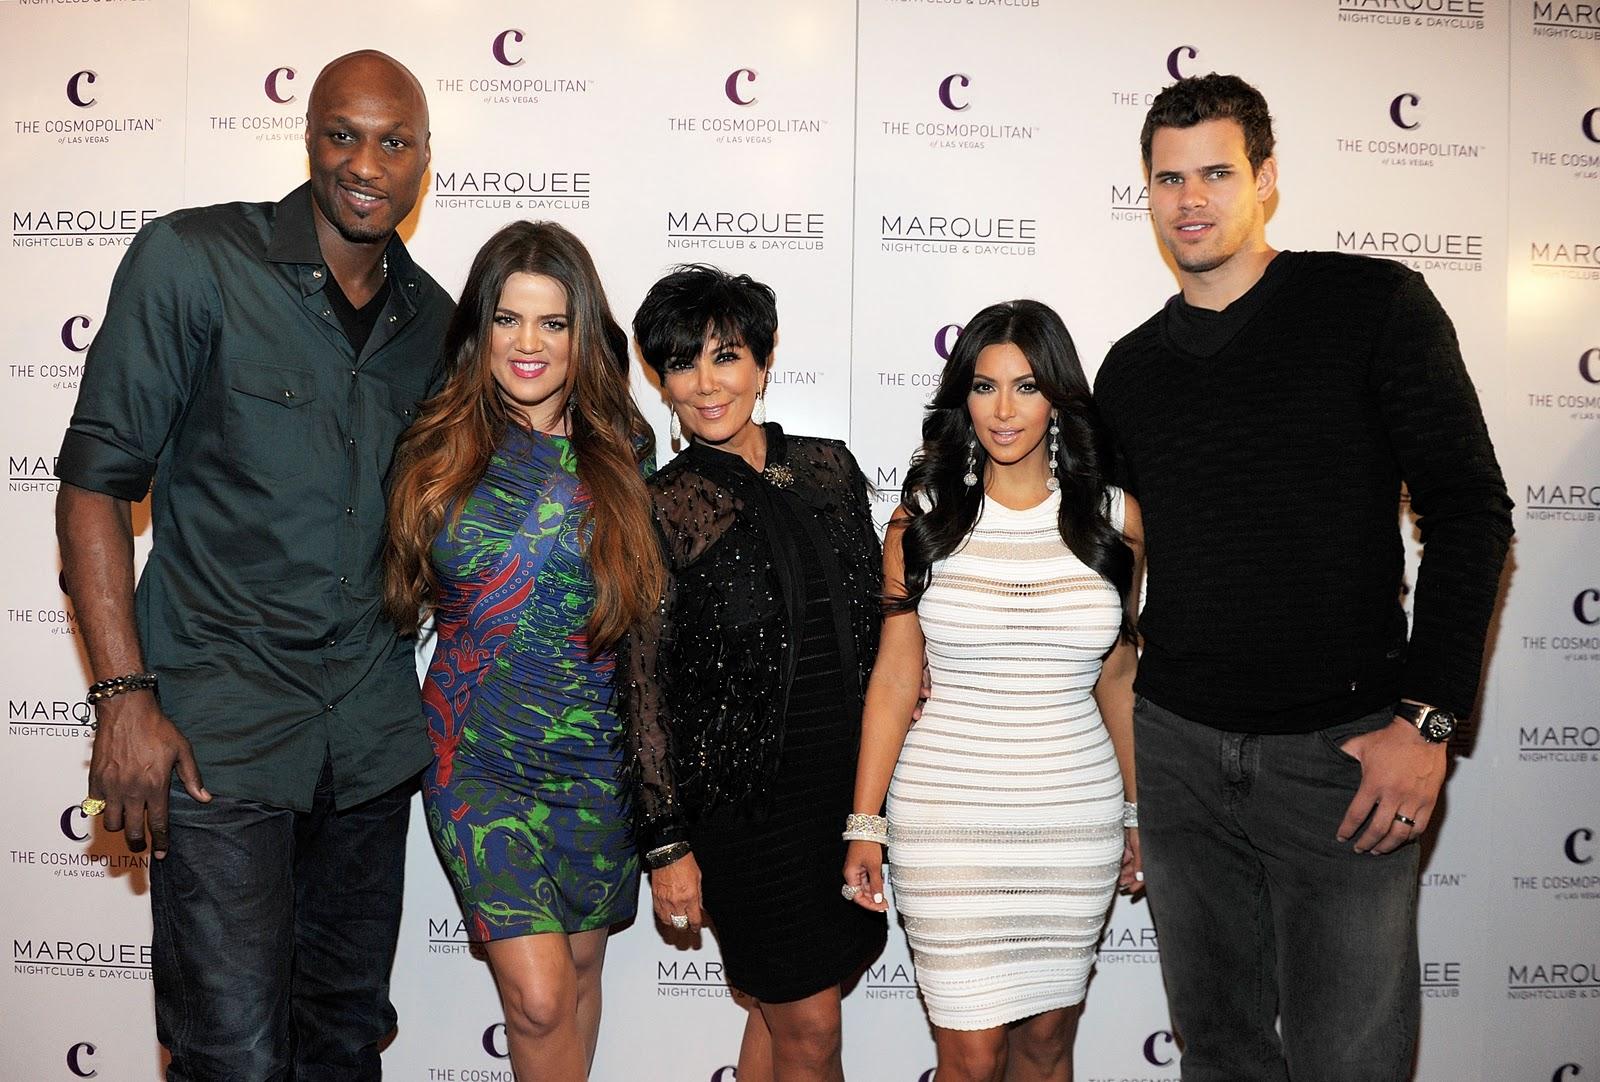 http://2.bp.blogspot.com/-oI2_mRiJYs8/TqamOcLm81I/AAAAAAAASYk/enJnqcJqcAk/s1600/Lamar+Odom_Khloe+Kardashia_Kris+Jenner_Kim+Kardashian_Kris+Humphries_Marquee+red+carpet.JPG